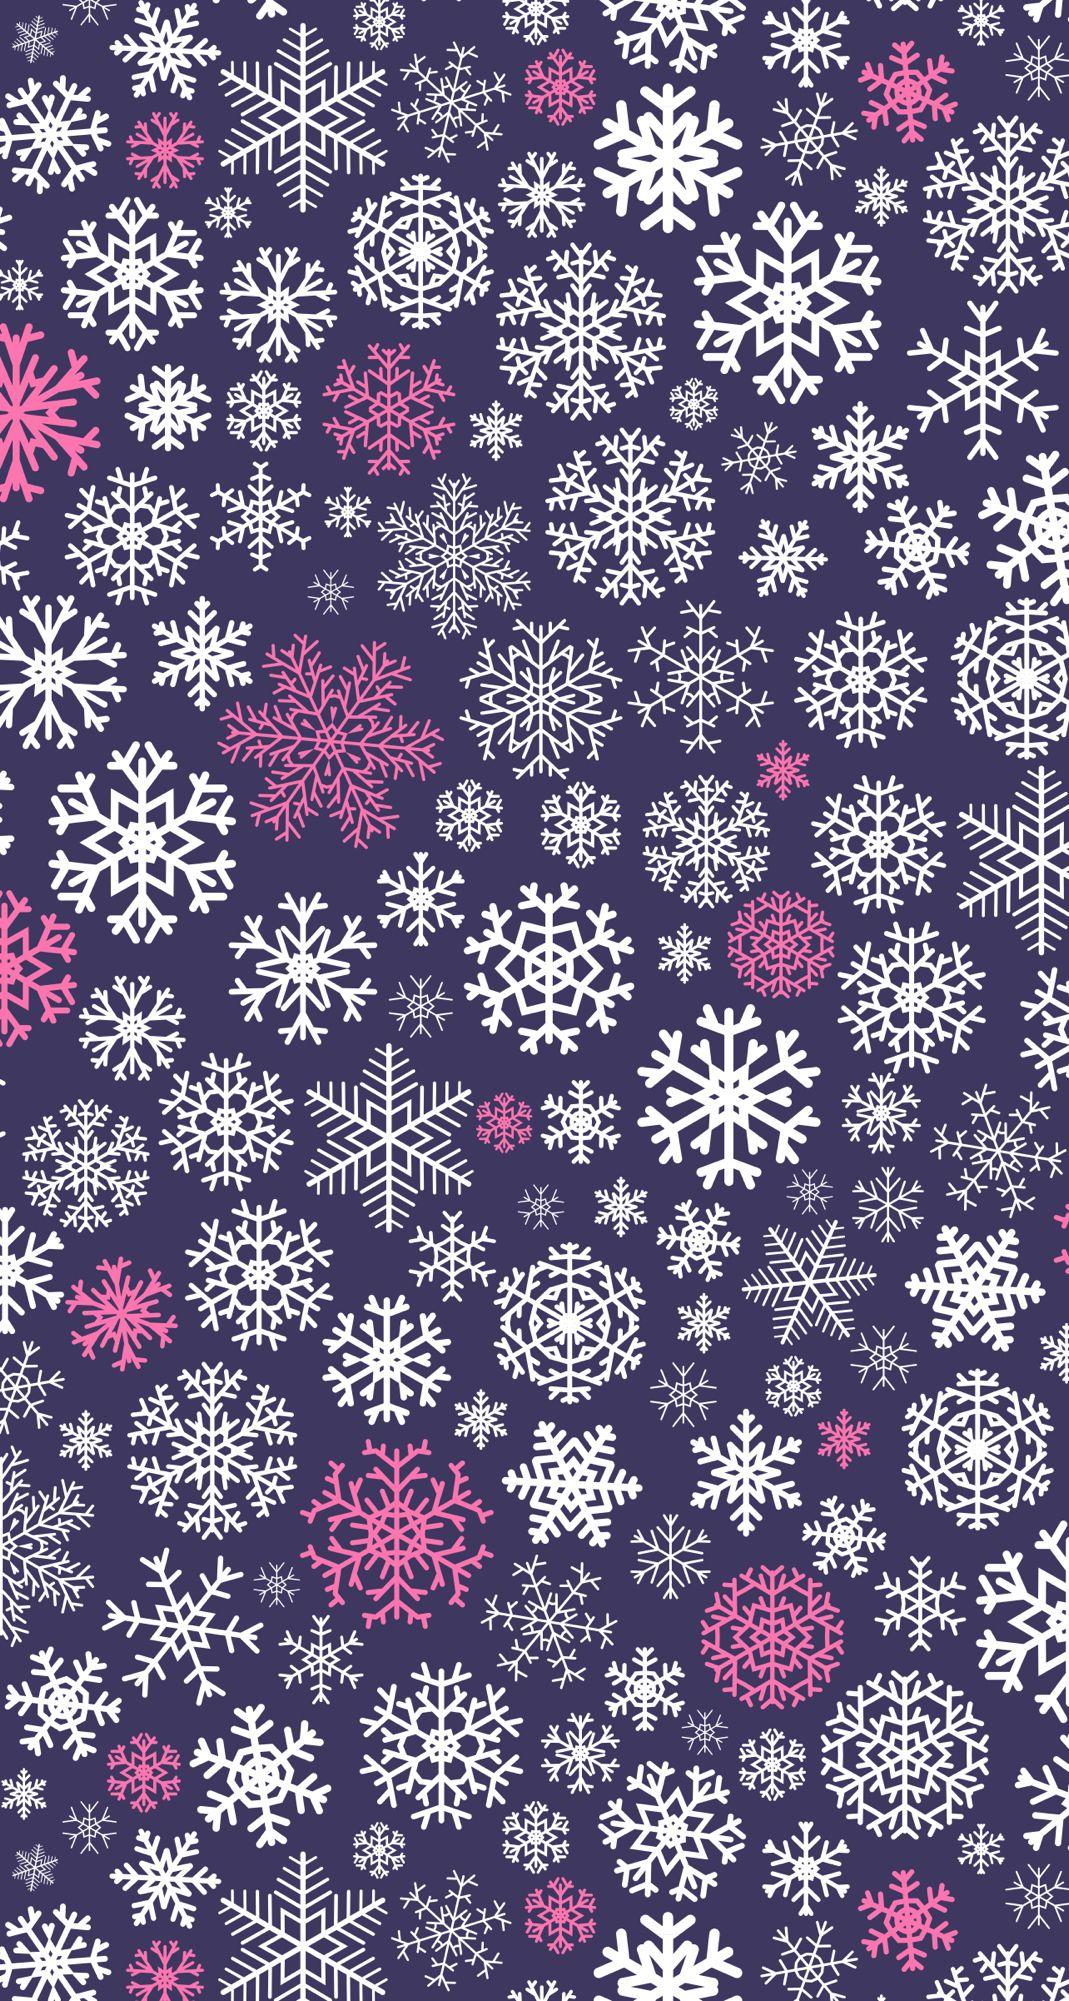 Purple Snowflakes Snowflake Wallpaper Winter Snow Wallpaper Winter Wallpaper